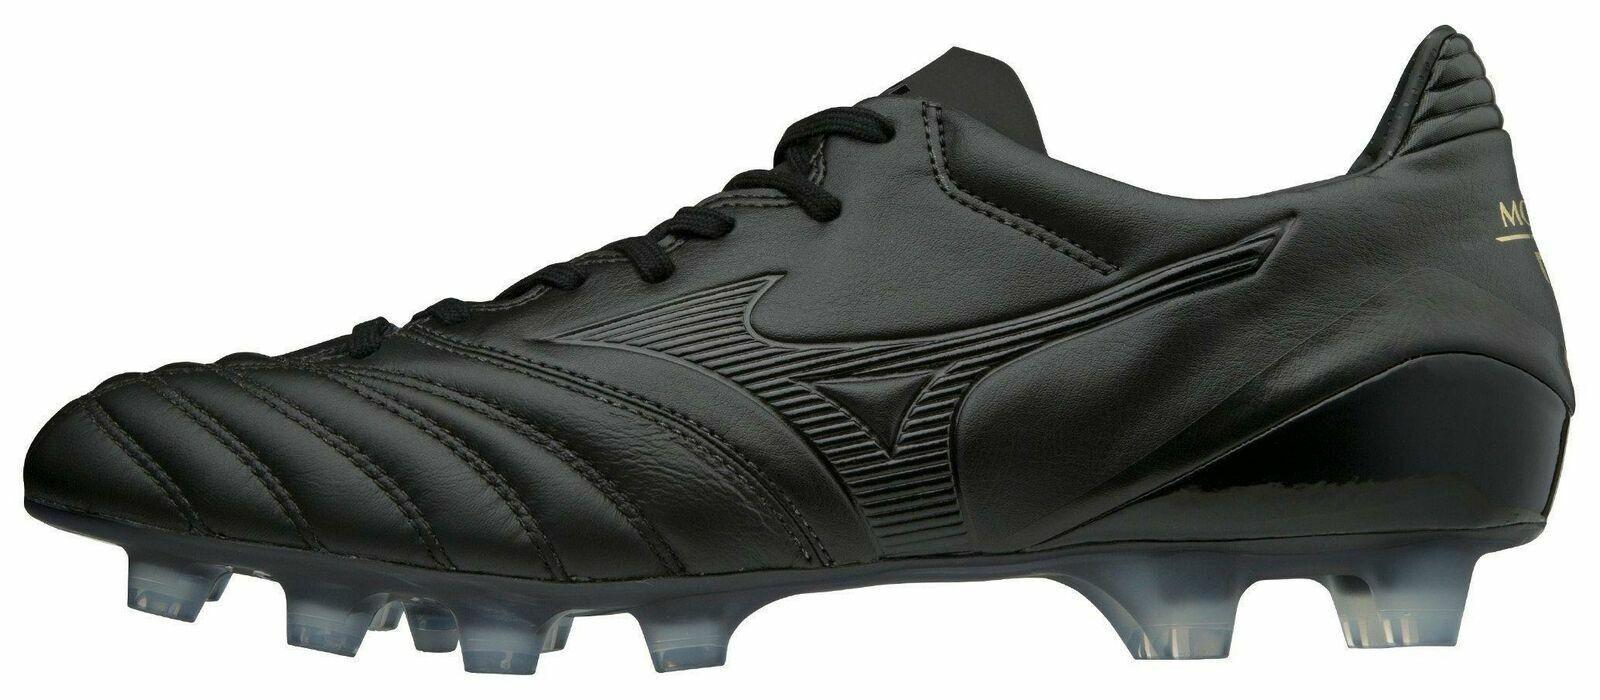 Mizuno Morelia Neo KL II MD Men's Soccer Shoes Cleat ALL BLA